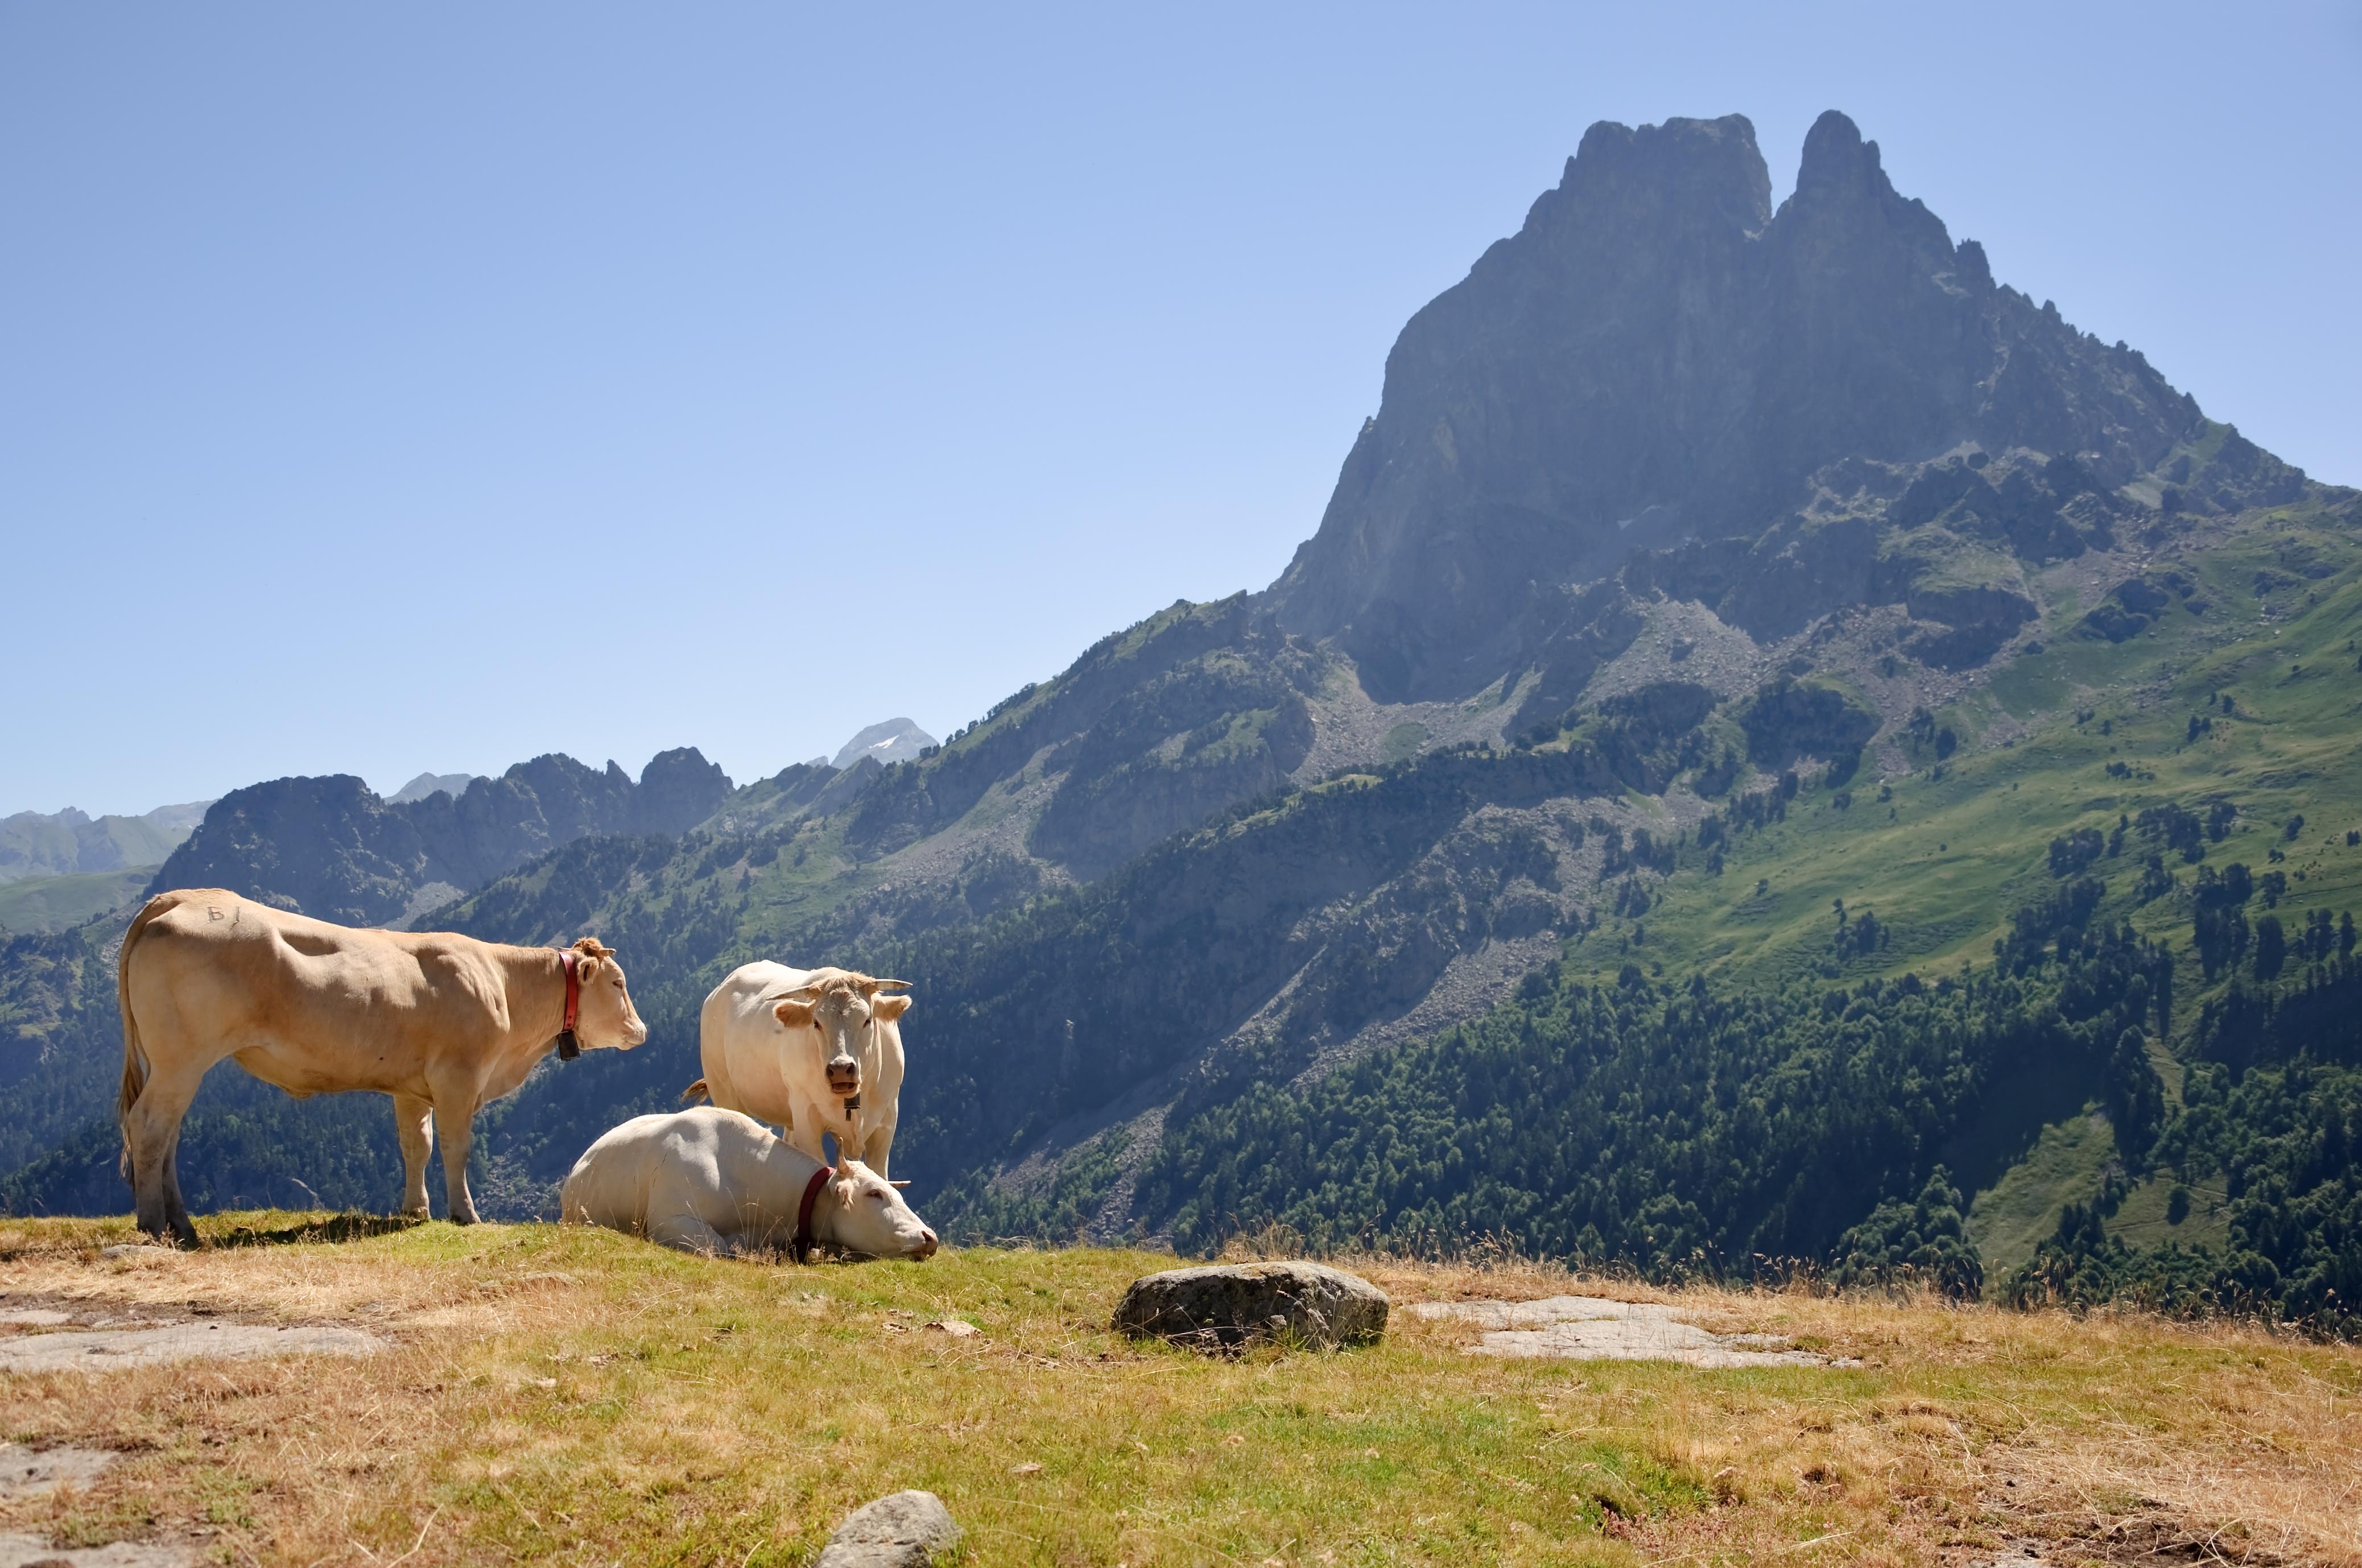 Http Commons Wikimedia Org Wiki File Bovins Estive Pic Du Midi Ossau Jpg